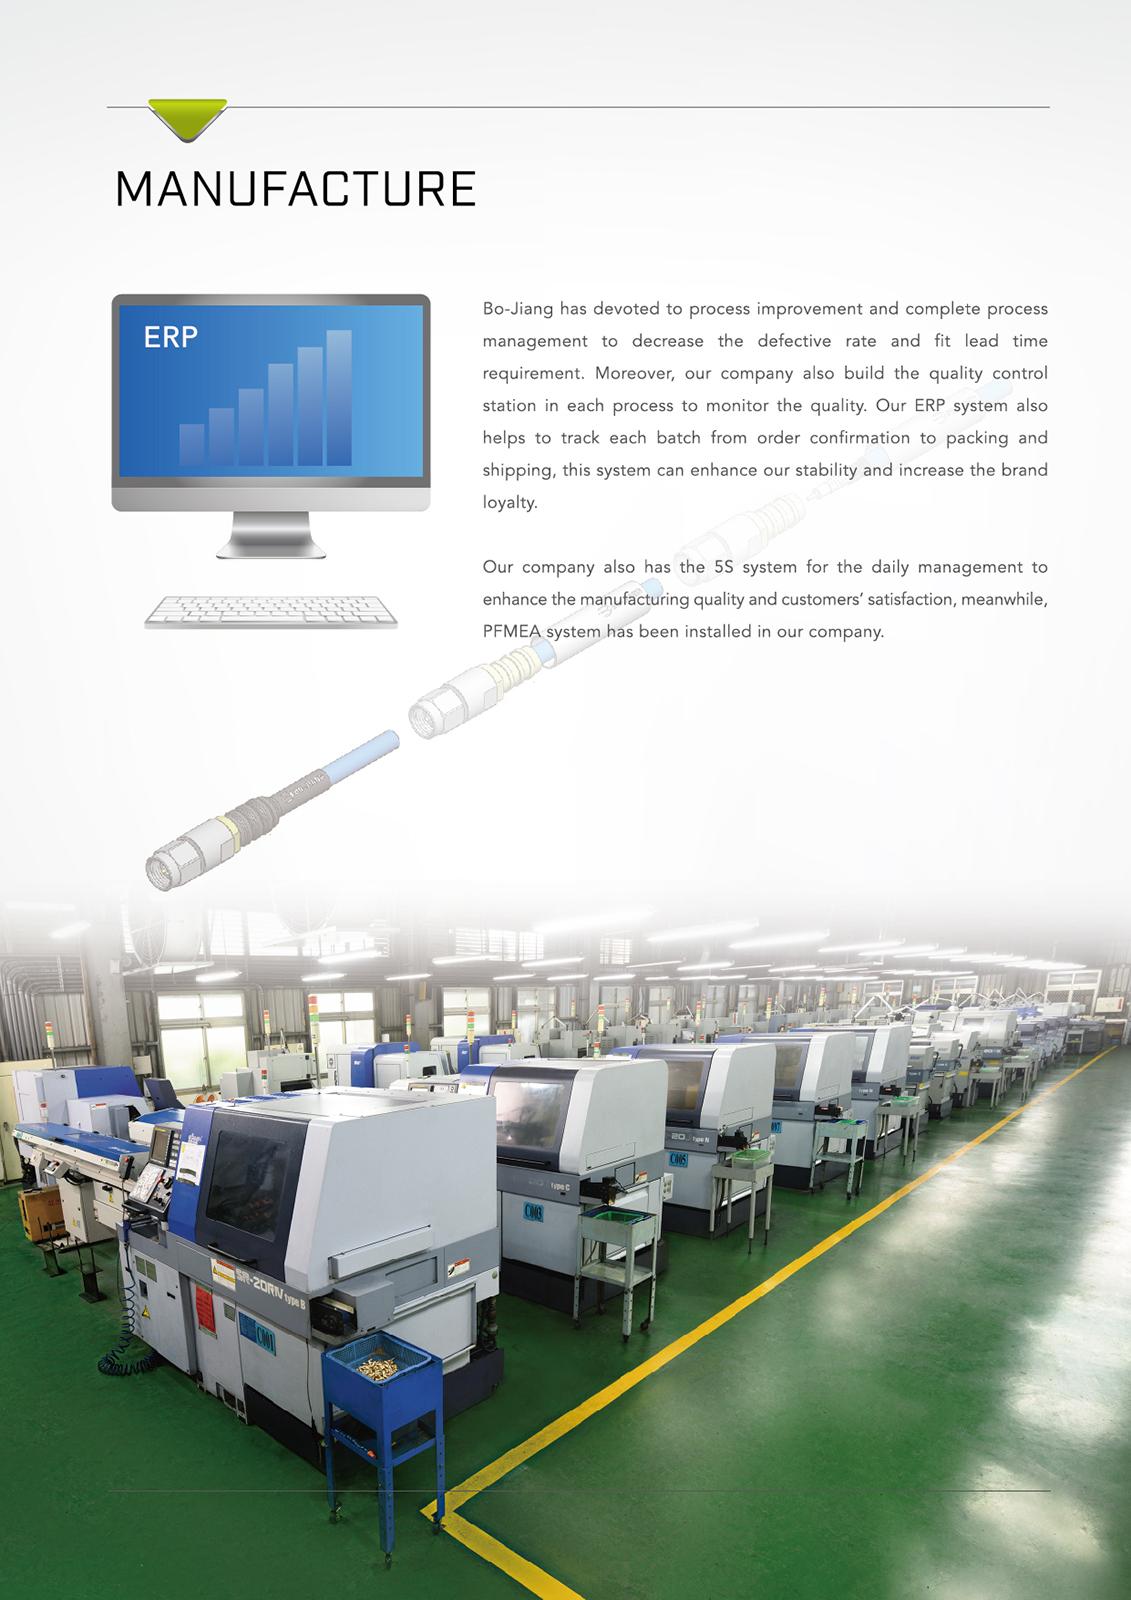 帛江科技manufacture